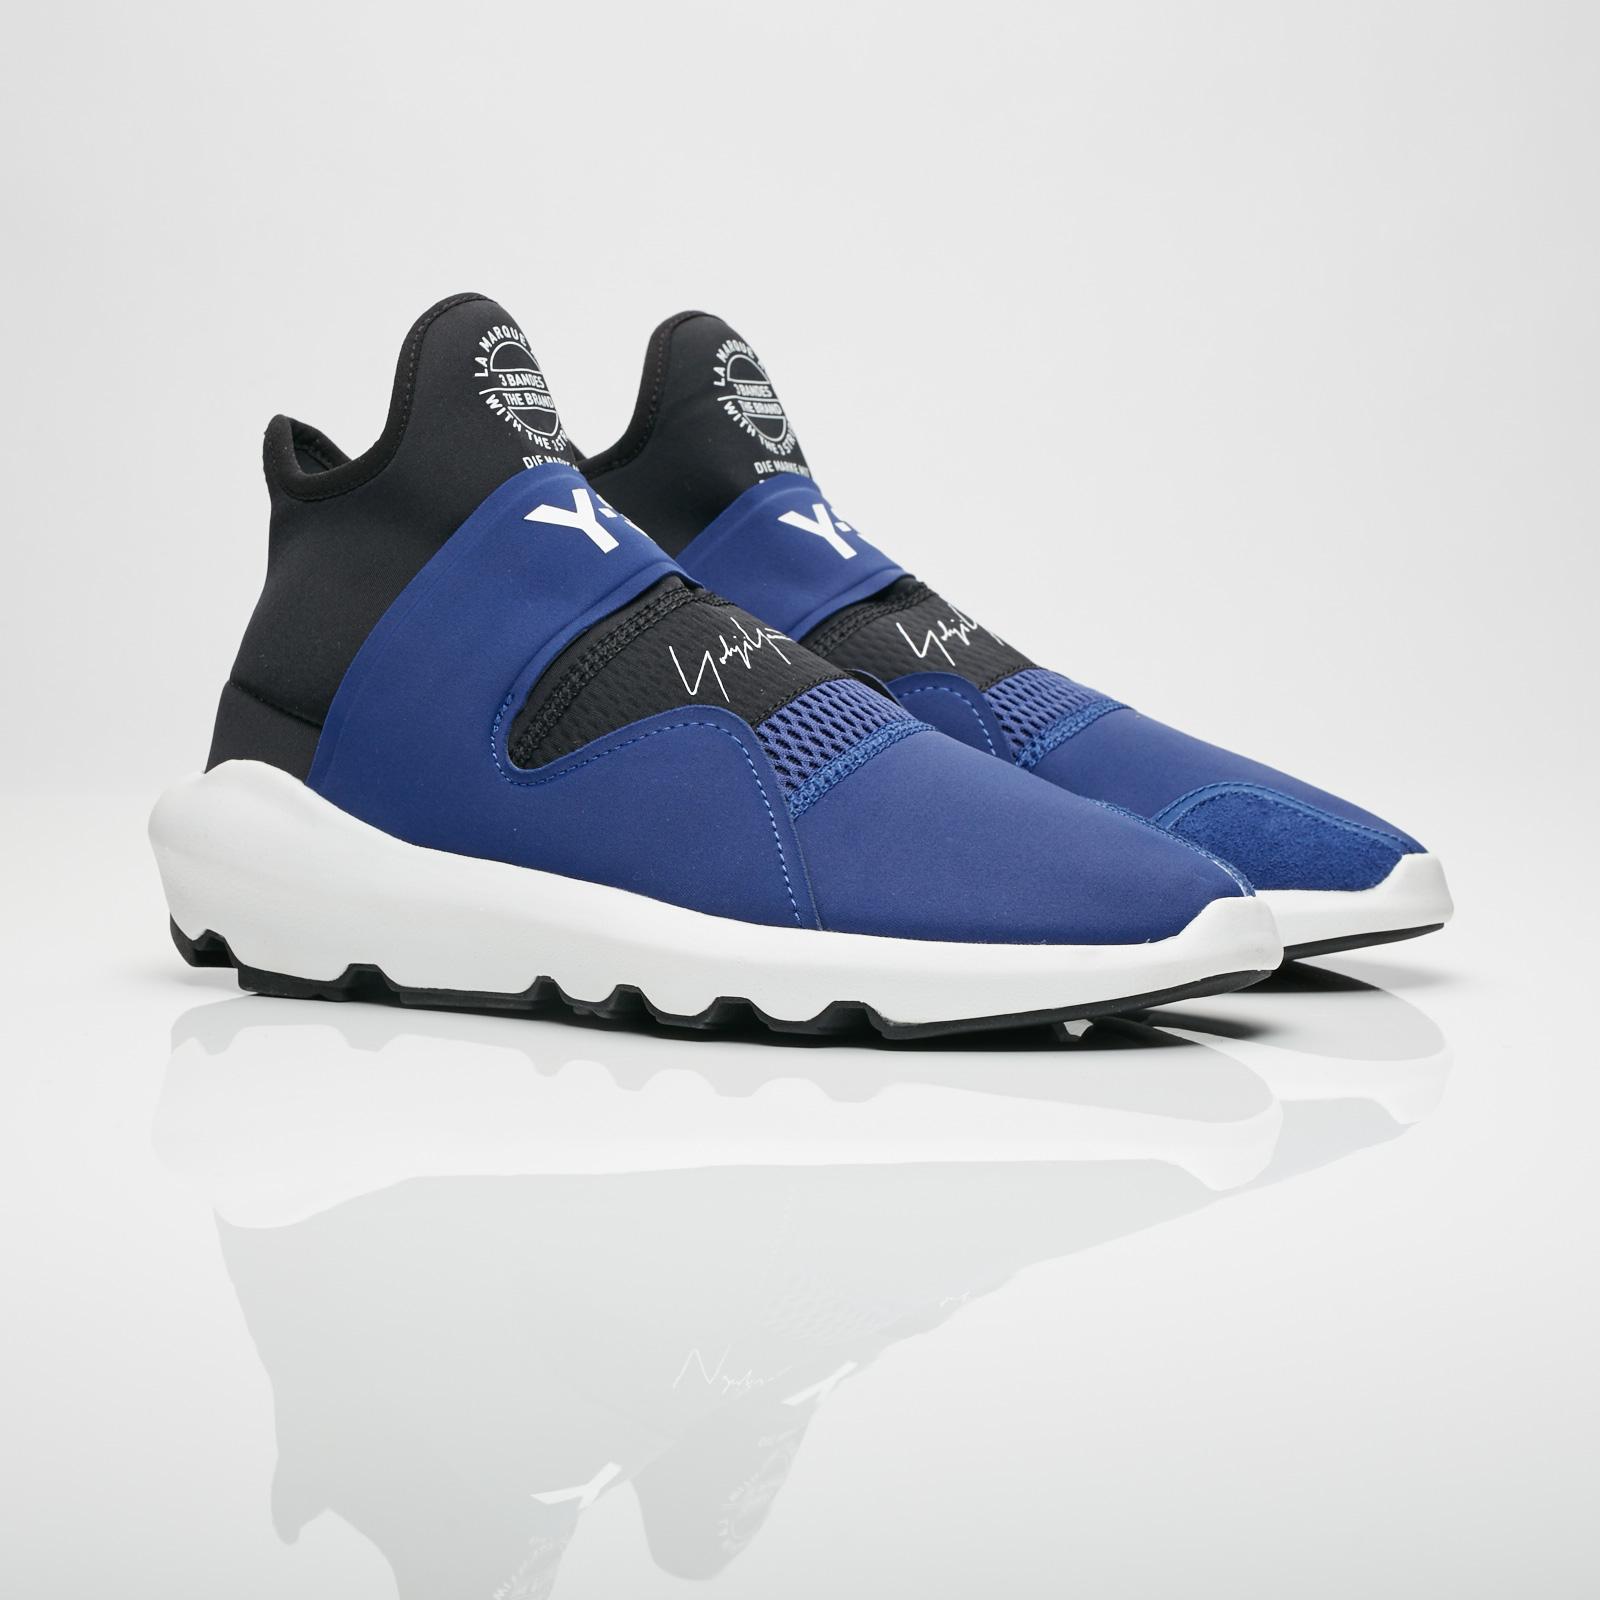 2dde9e3ccd93 adidas Suberou - Ac7199 - Sneakersnstuff